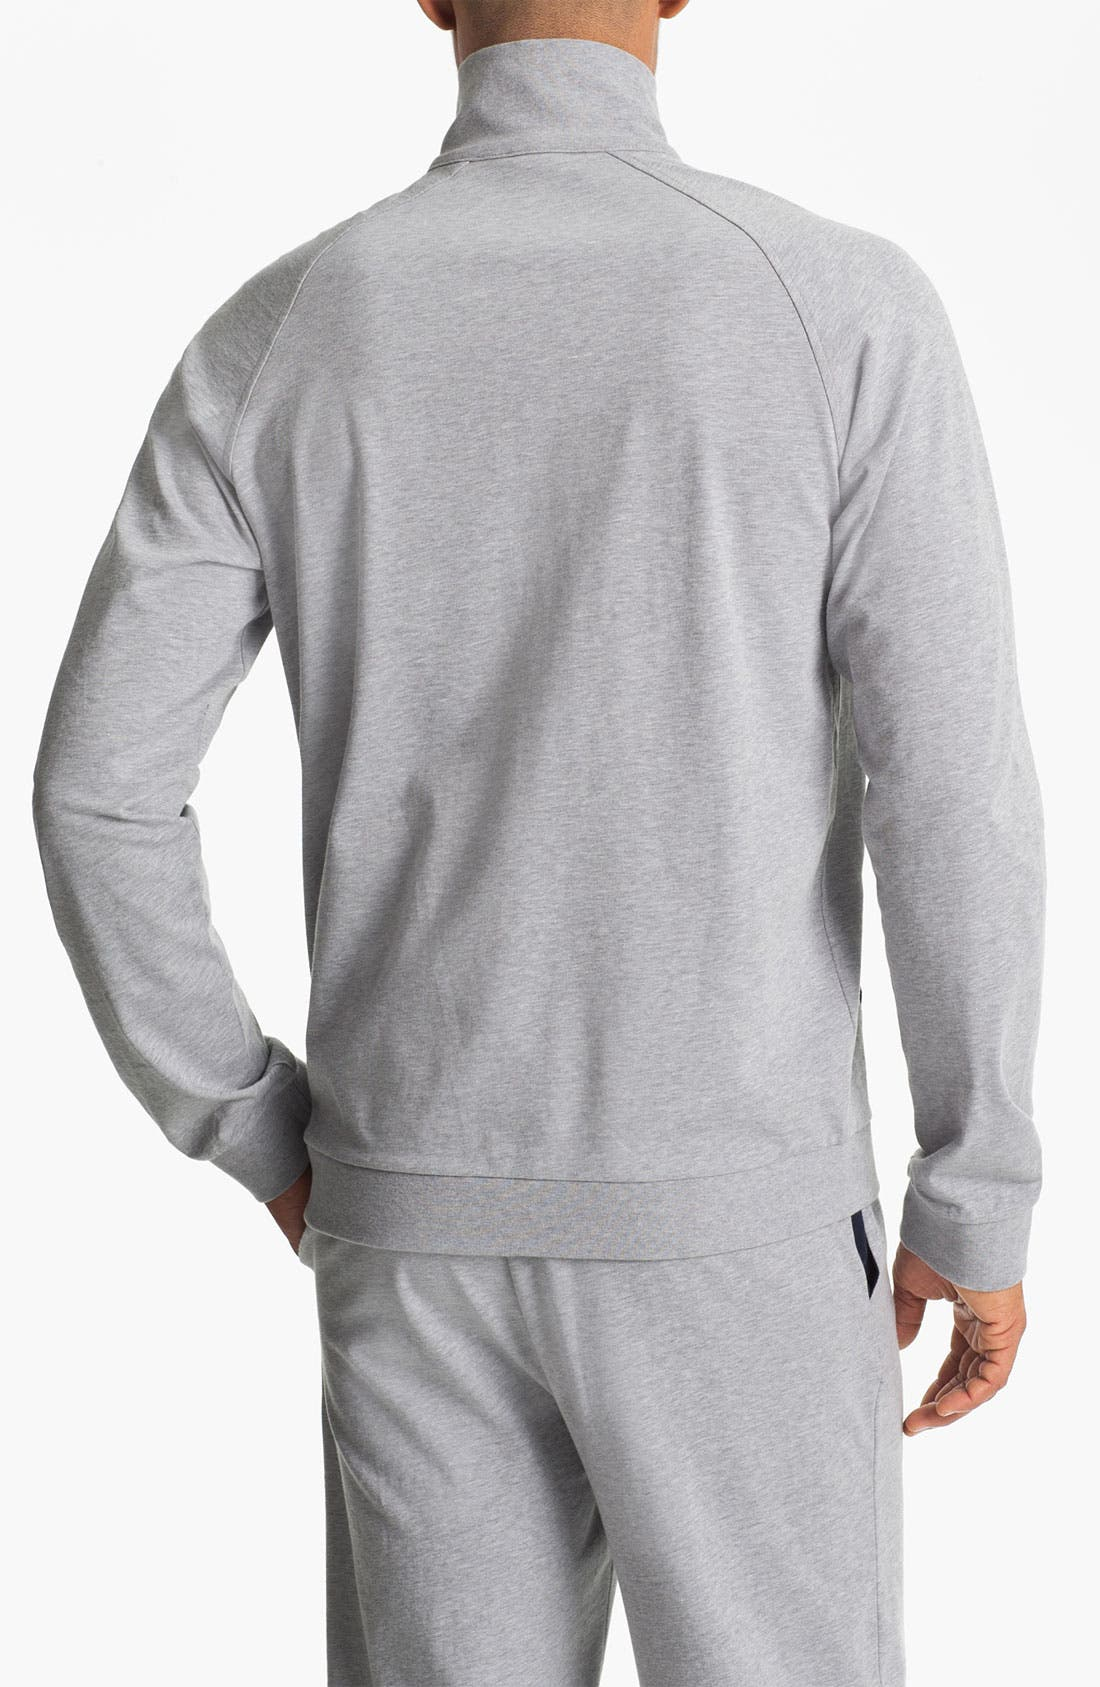 Alternate Image 2  - BOSS HUGO BOSS 'Innovation' Full Zip Cotton Track Jacket